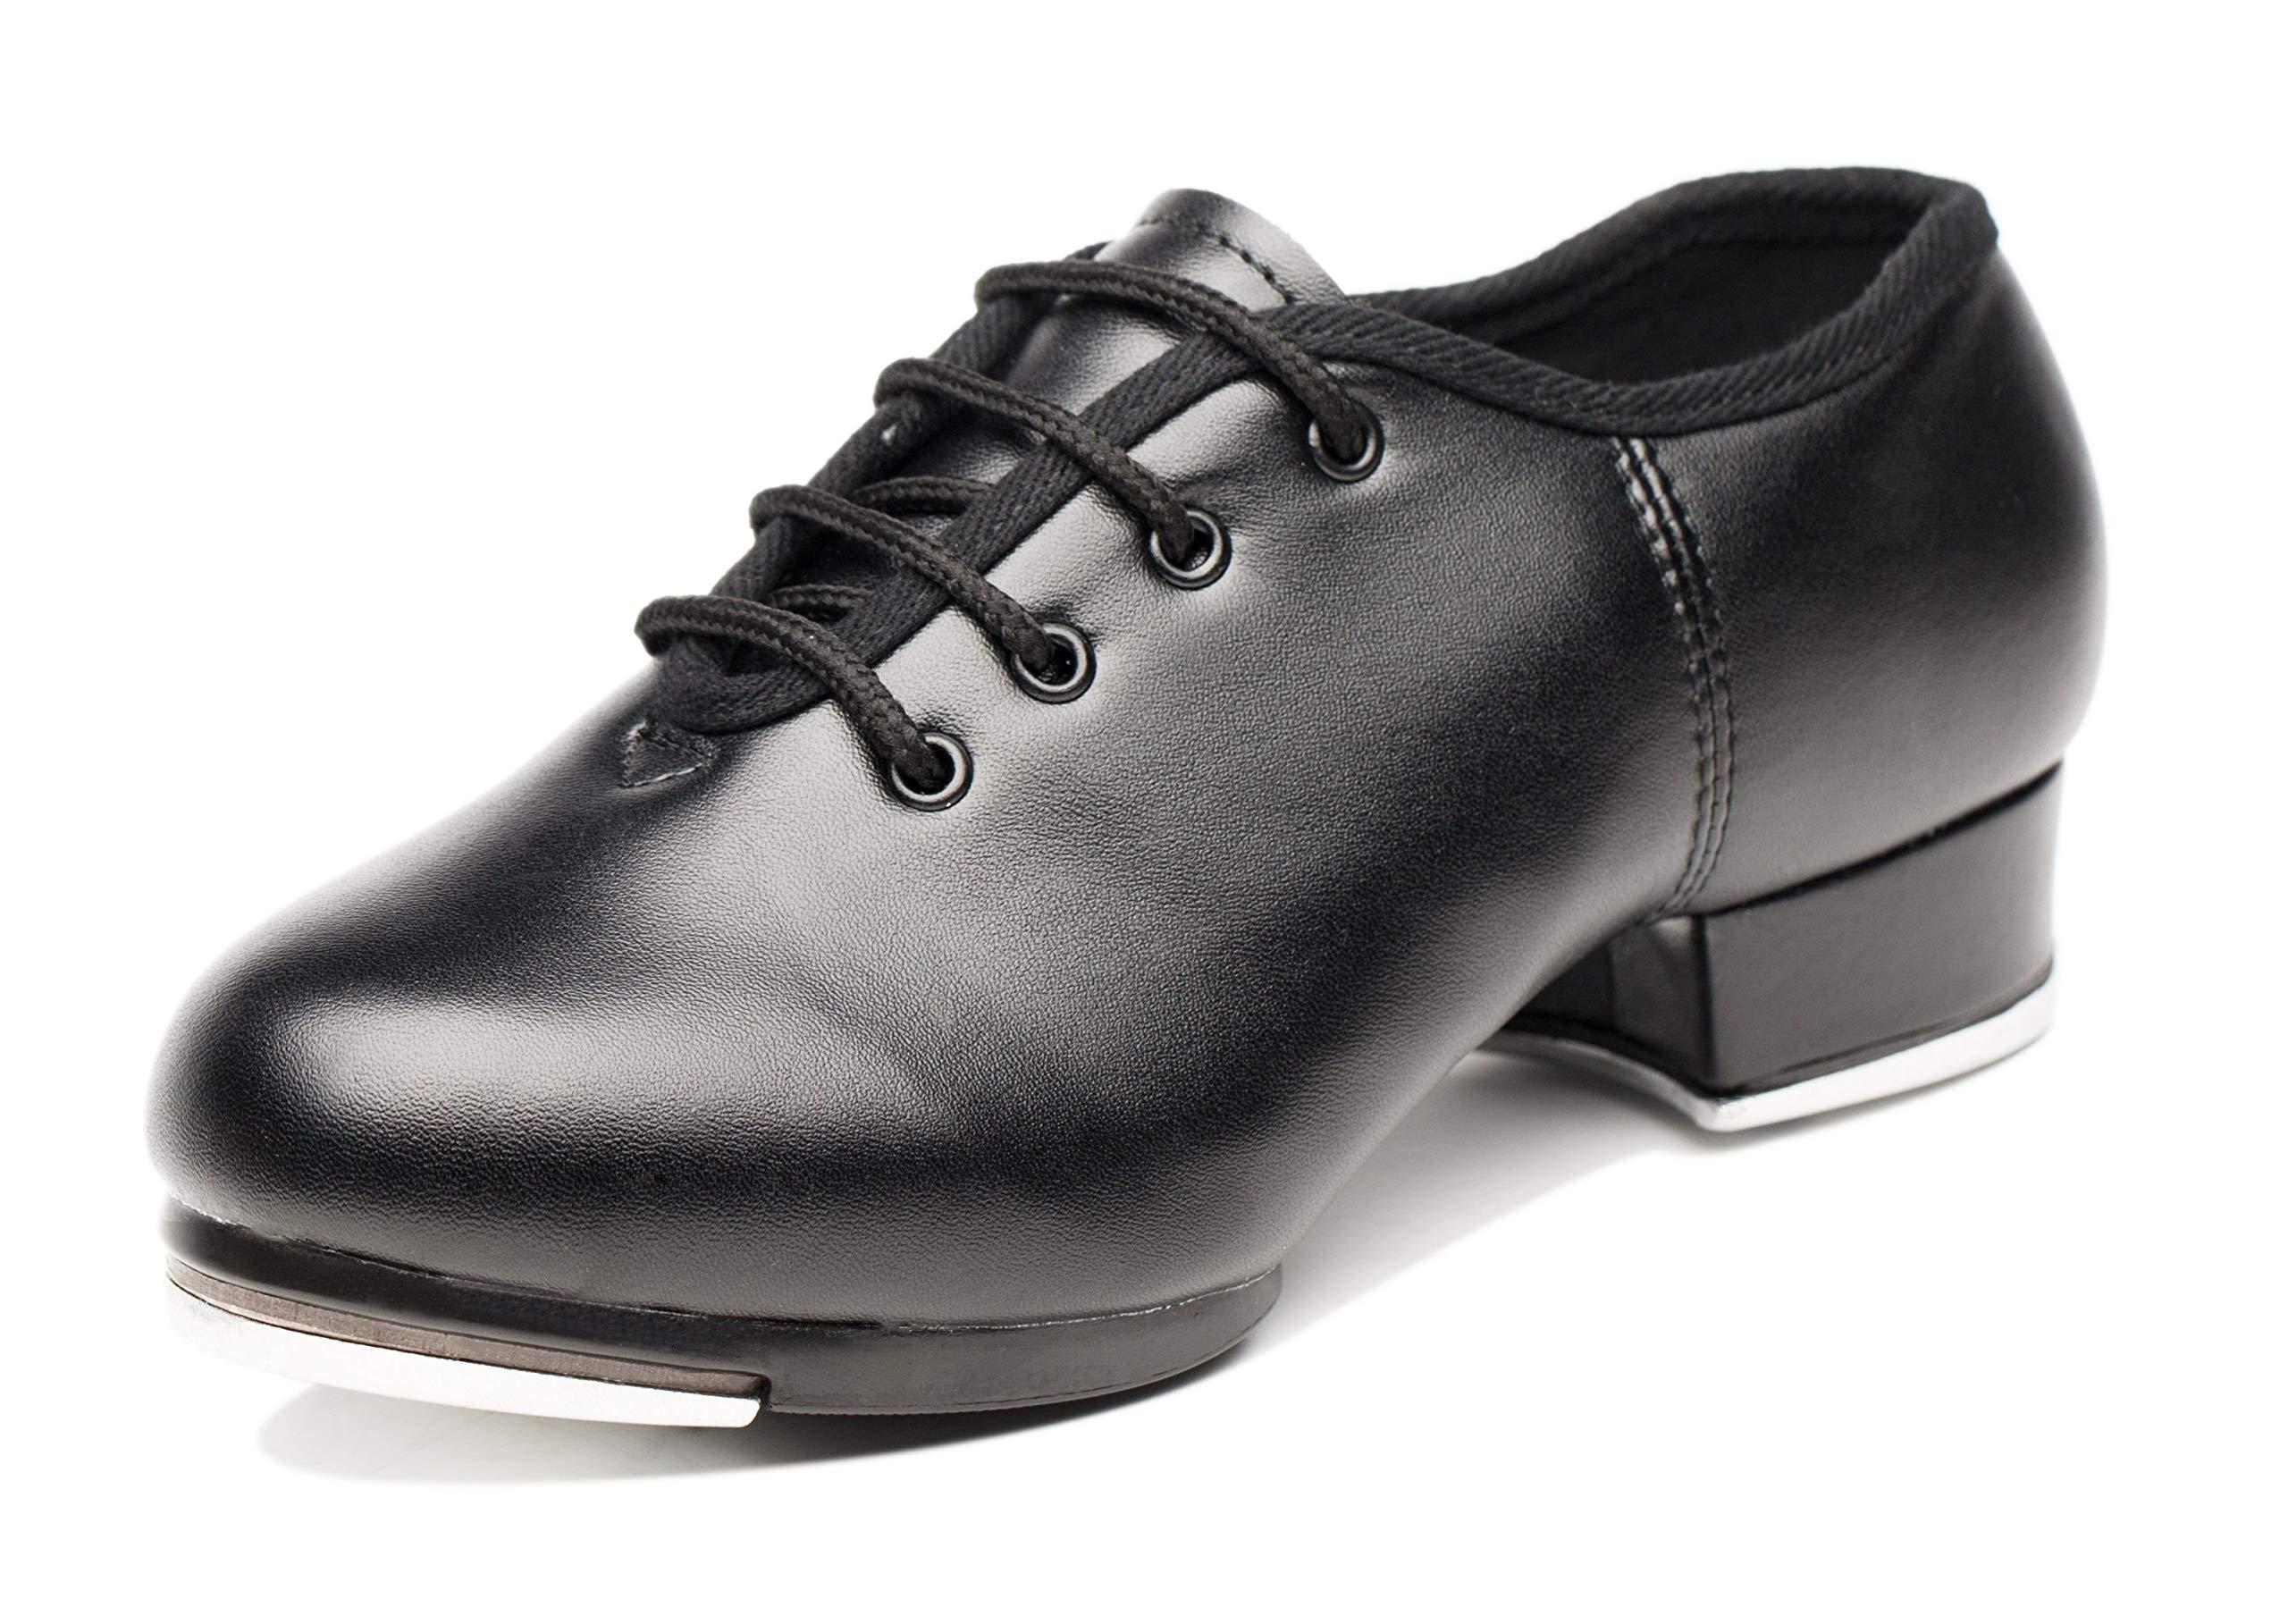 Joocare Child Split Sole Beginner Tap Dance Shoes (Toddler/Little Kid/Big Kid) (13.5M US) Black by Joocare